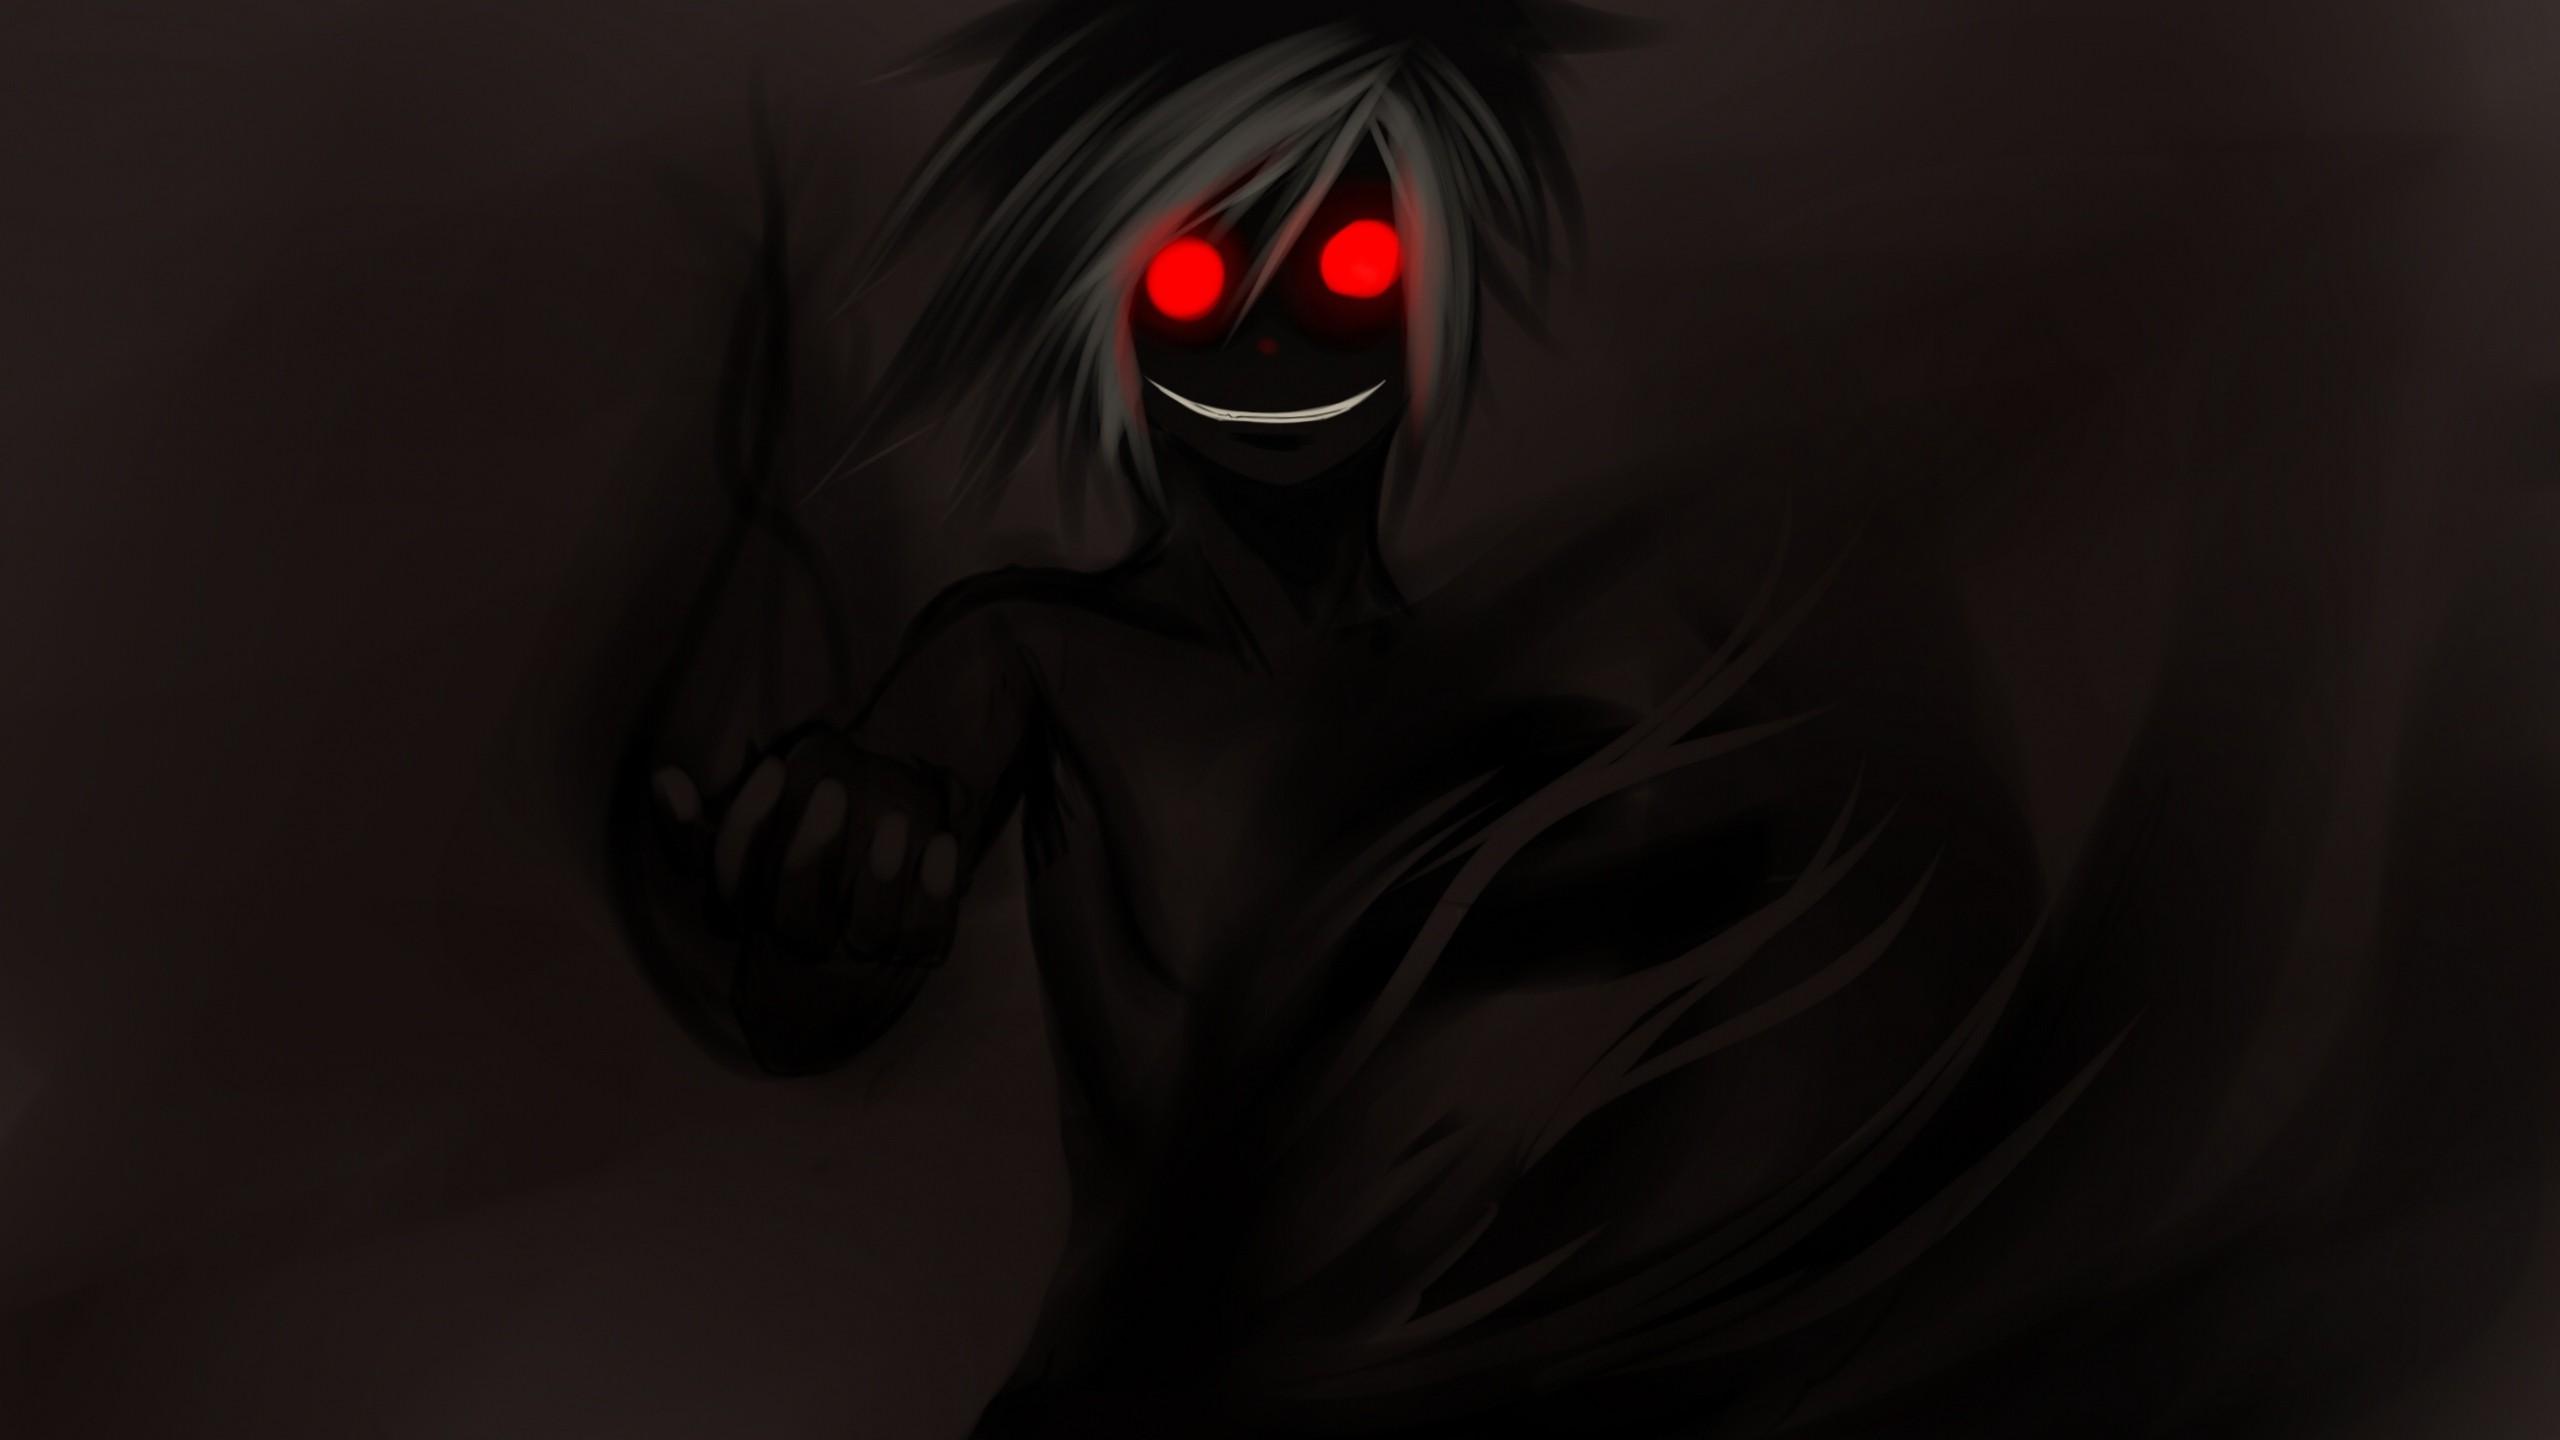 Wallpaper dark anime boys red eyes demon darkness - Wallpaper dark anime ...